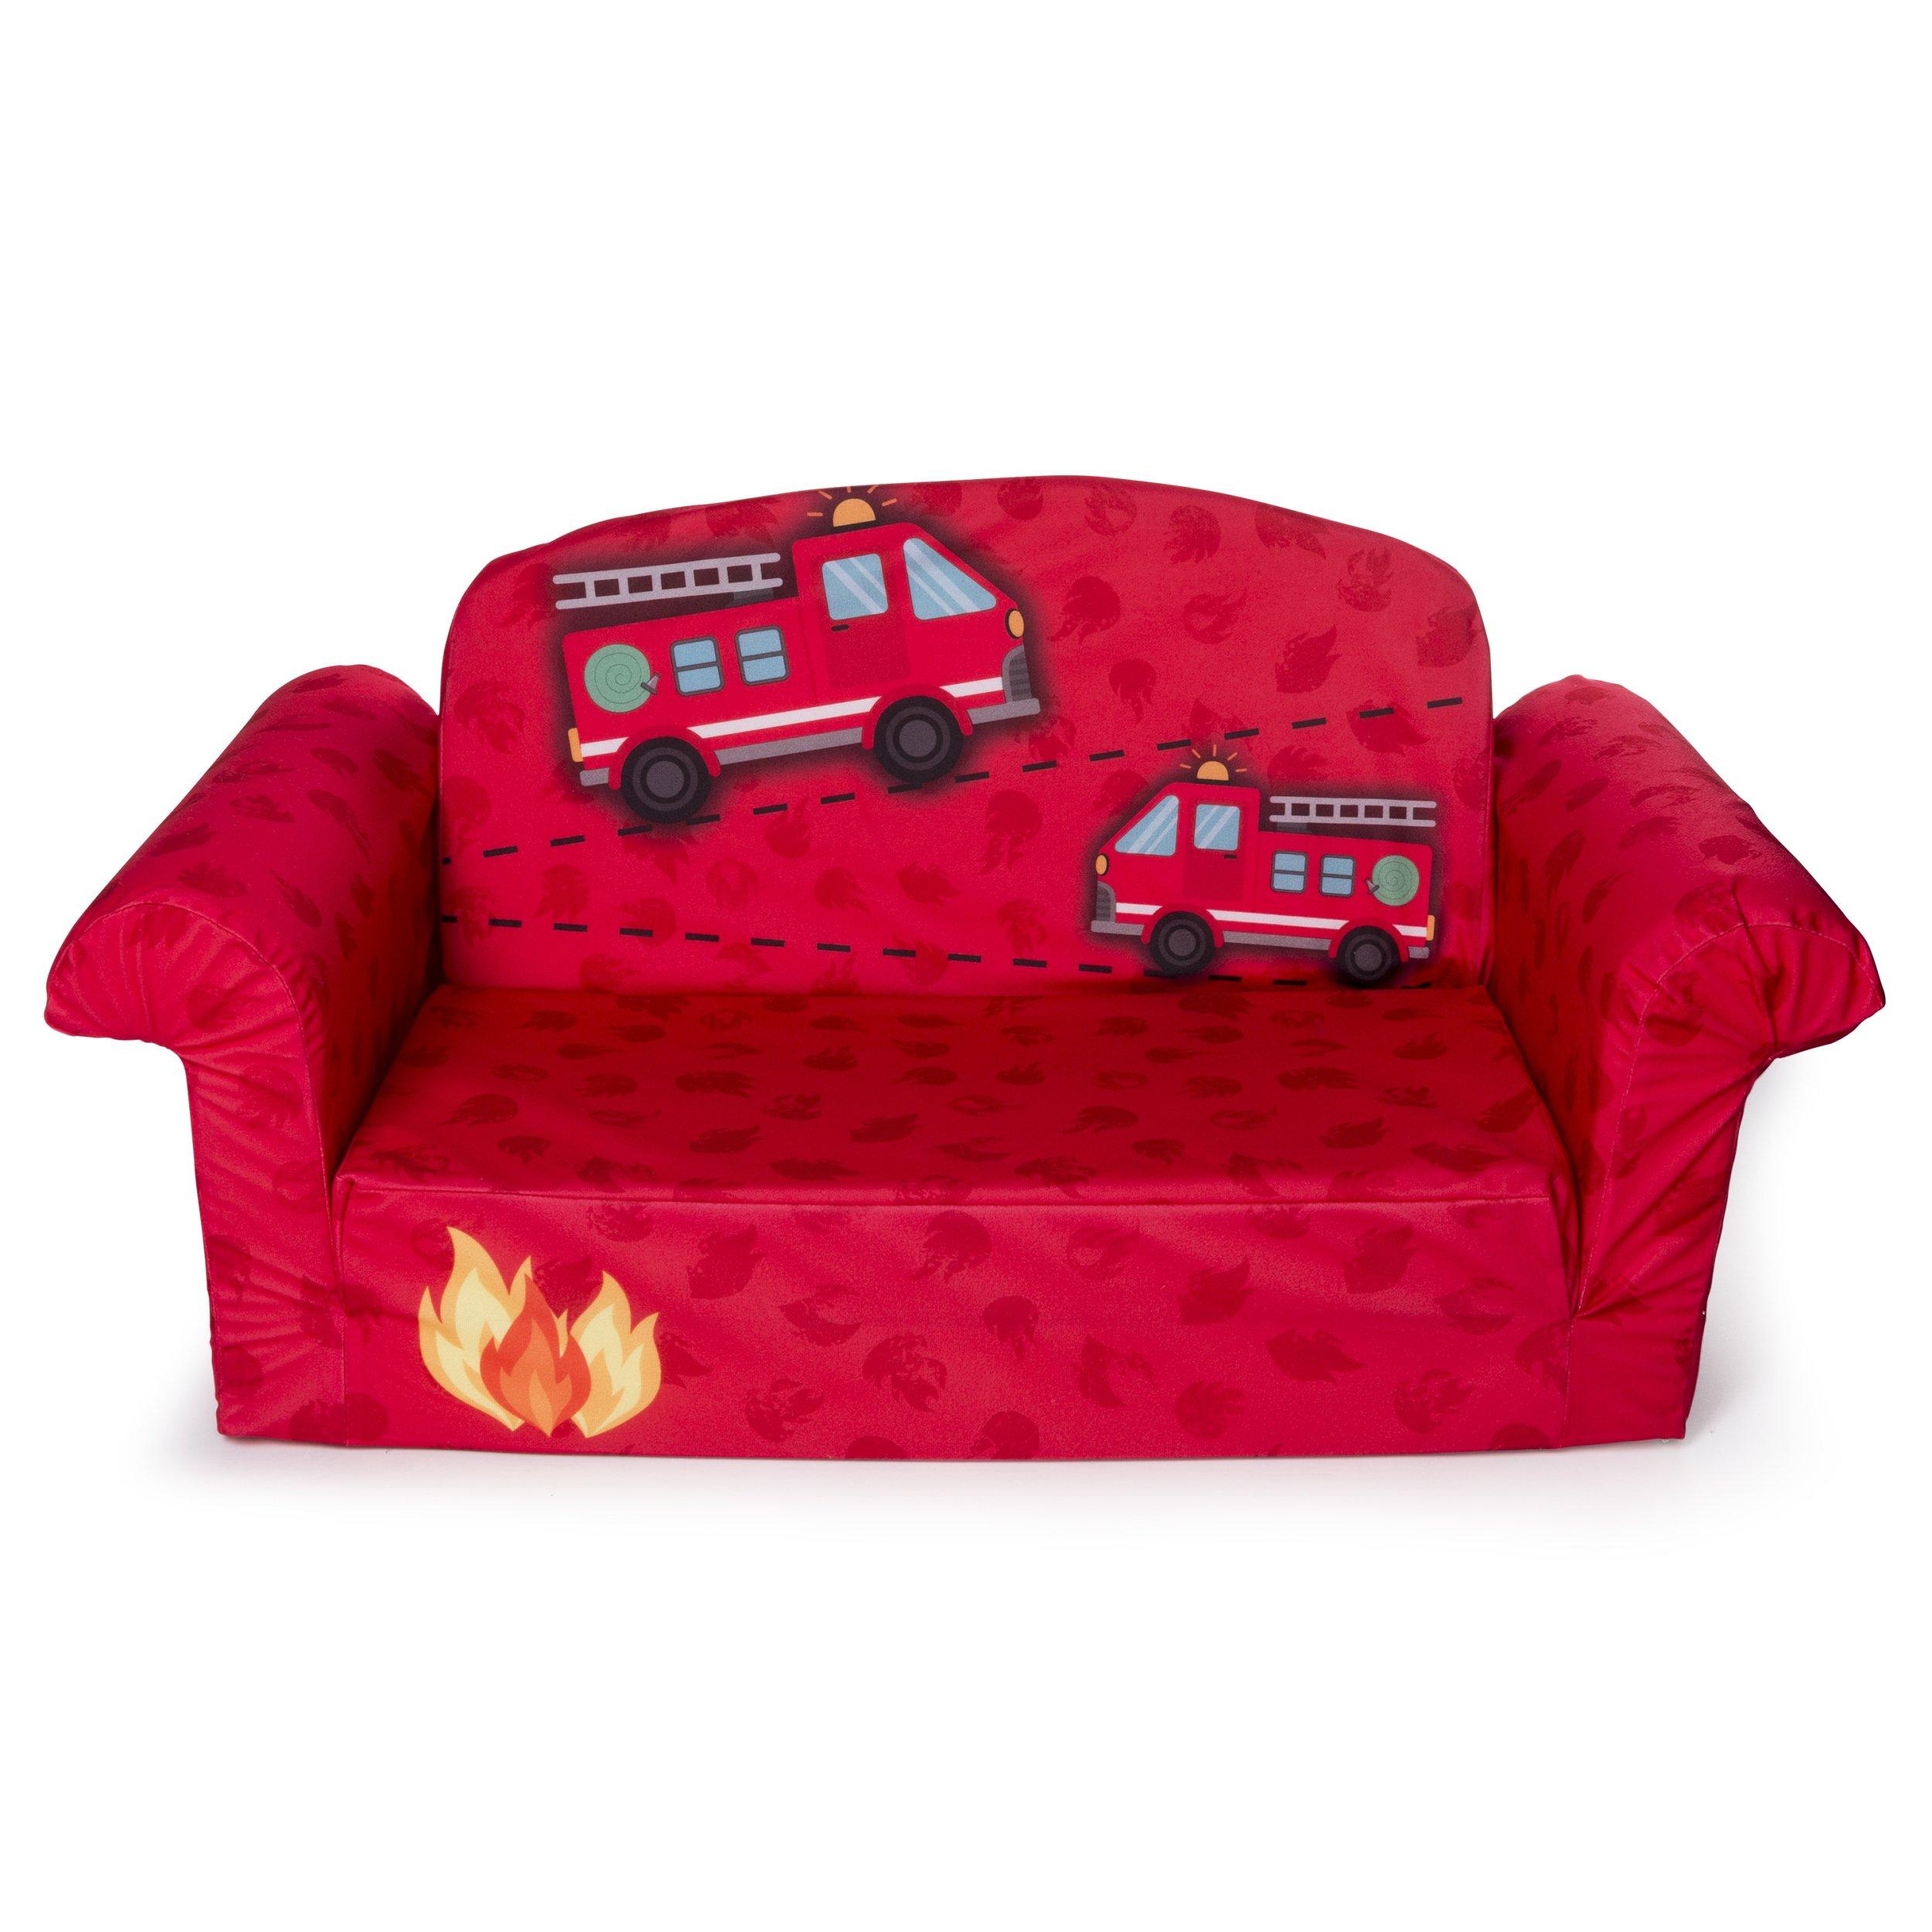 Marshmallow Furniture - Children's 2 in 1 Fire Truck Flip Open Foam Sofa (Amazon Exclusive) by Marshmallow Furniture